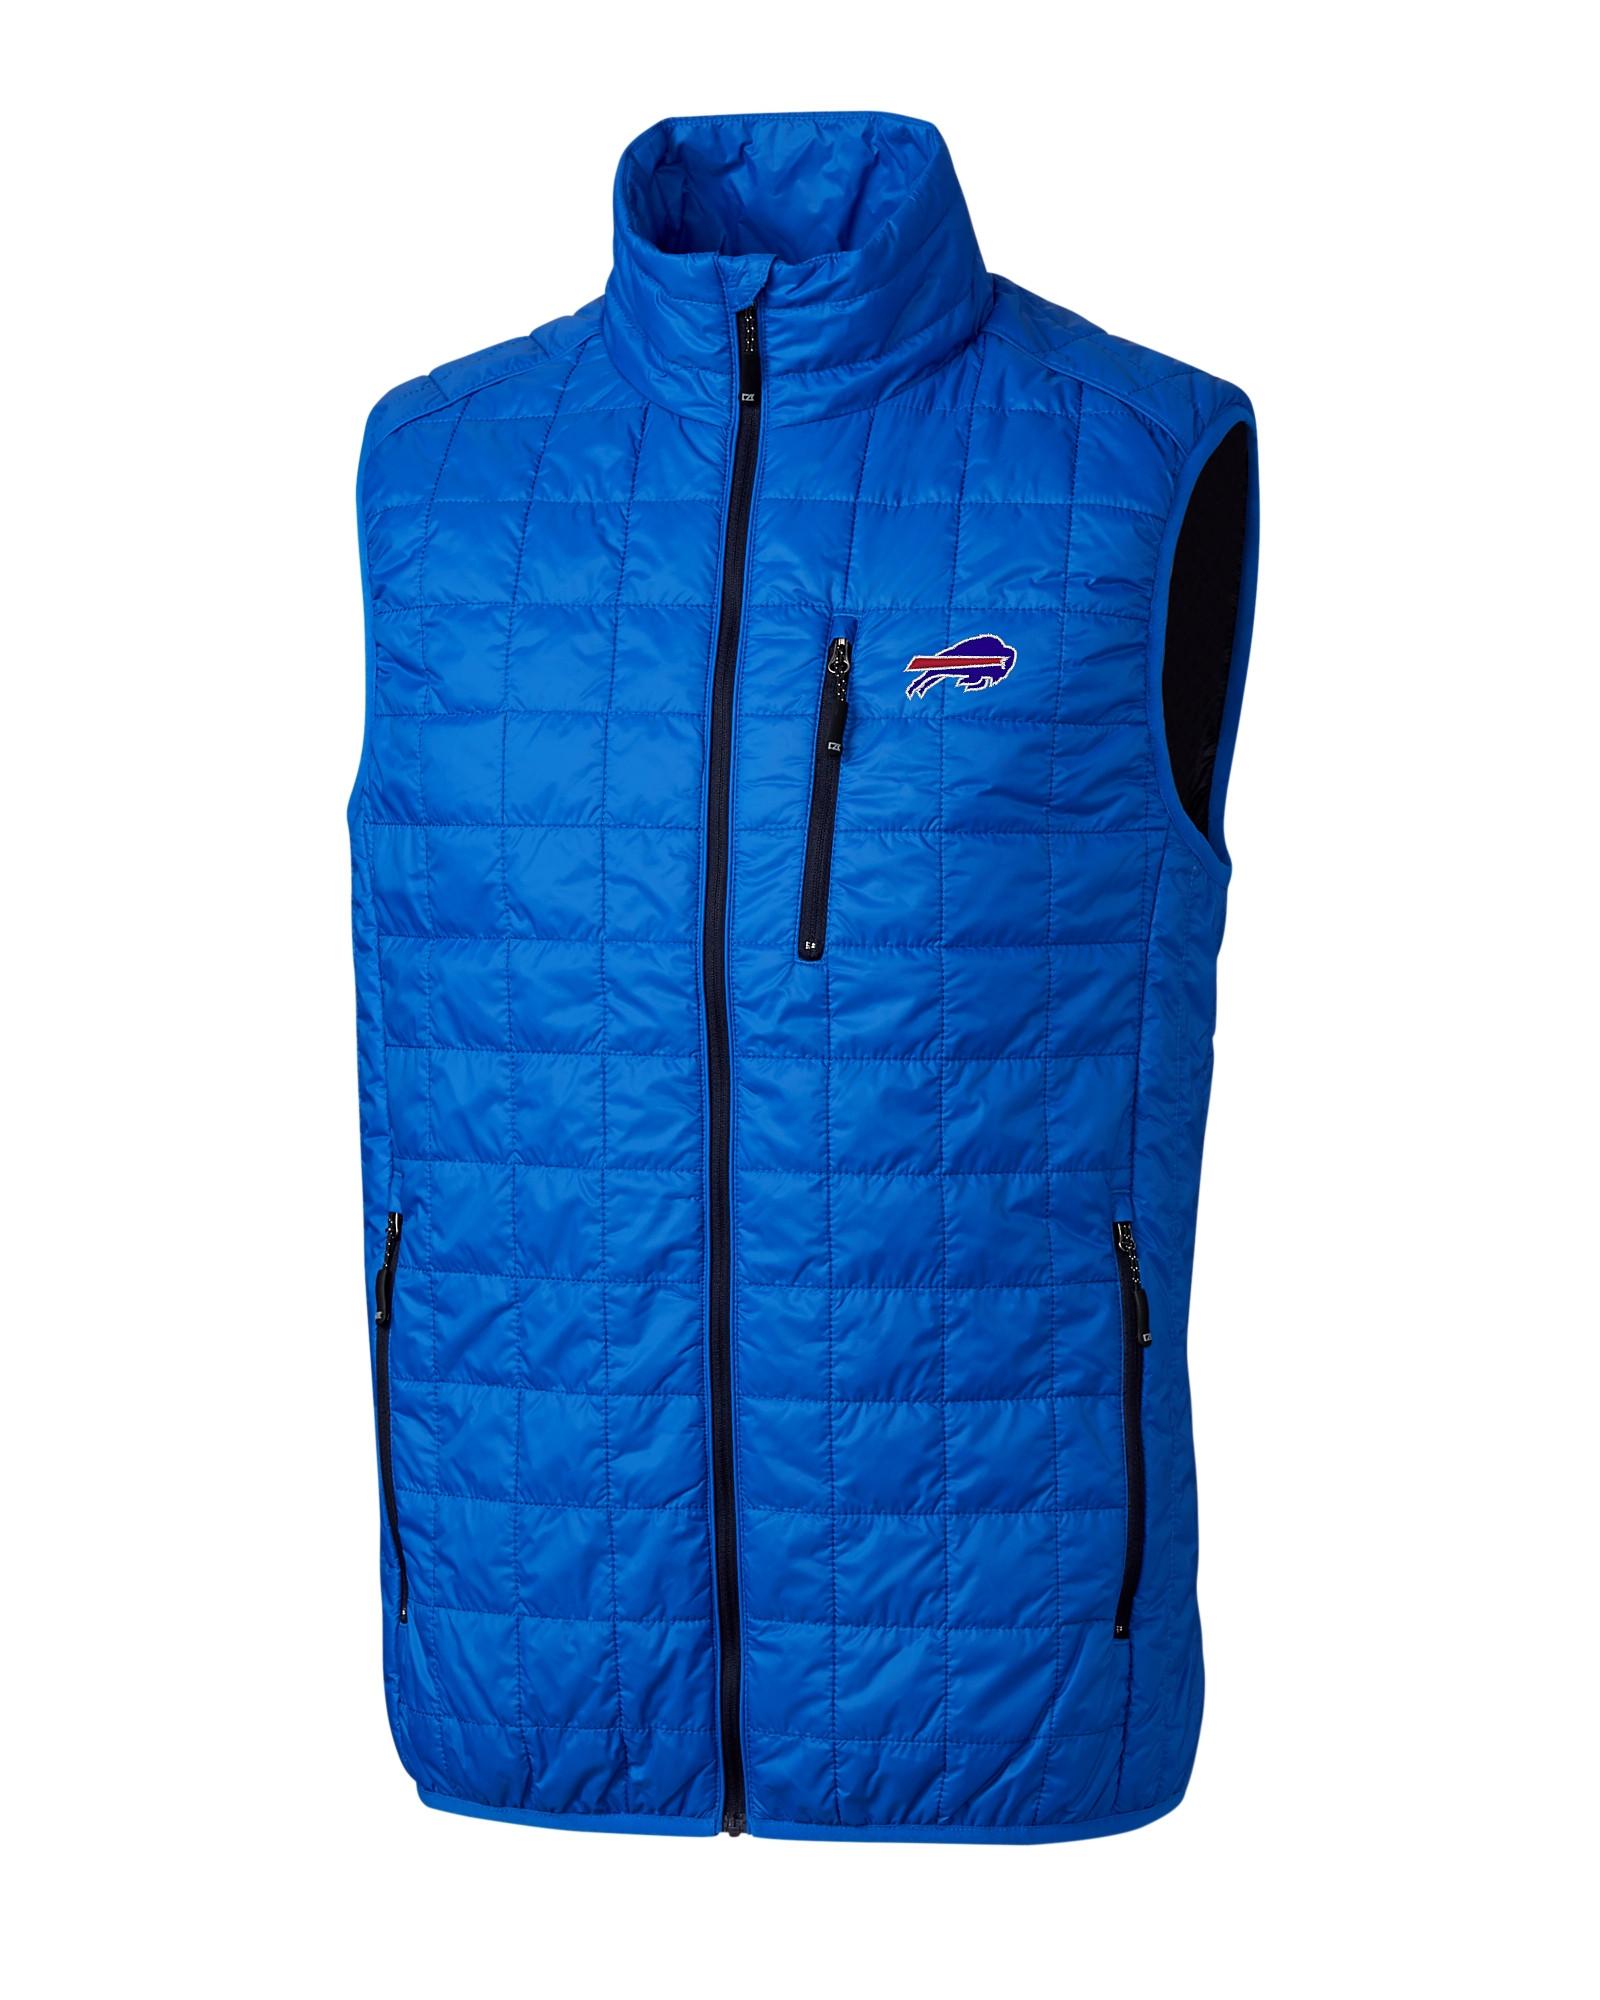 64970ed8 Buffalo Bills Rainier Vest